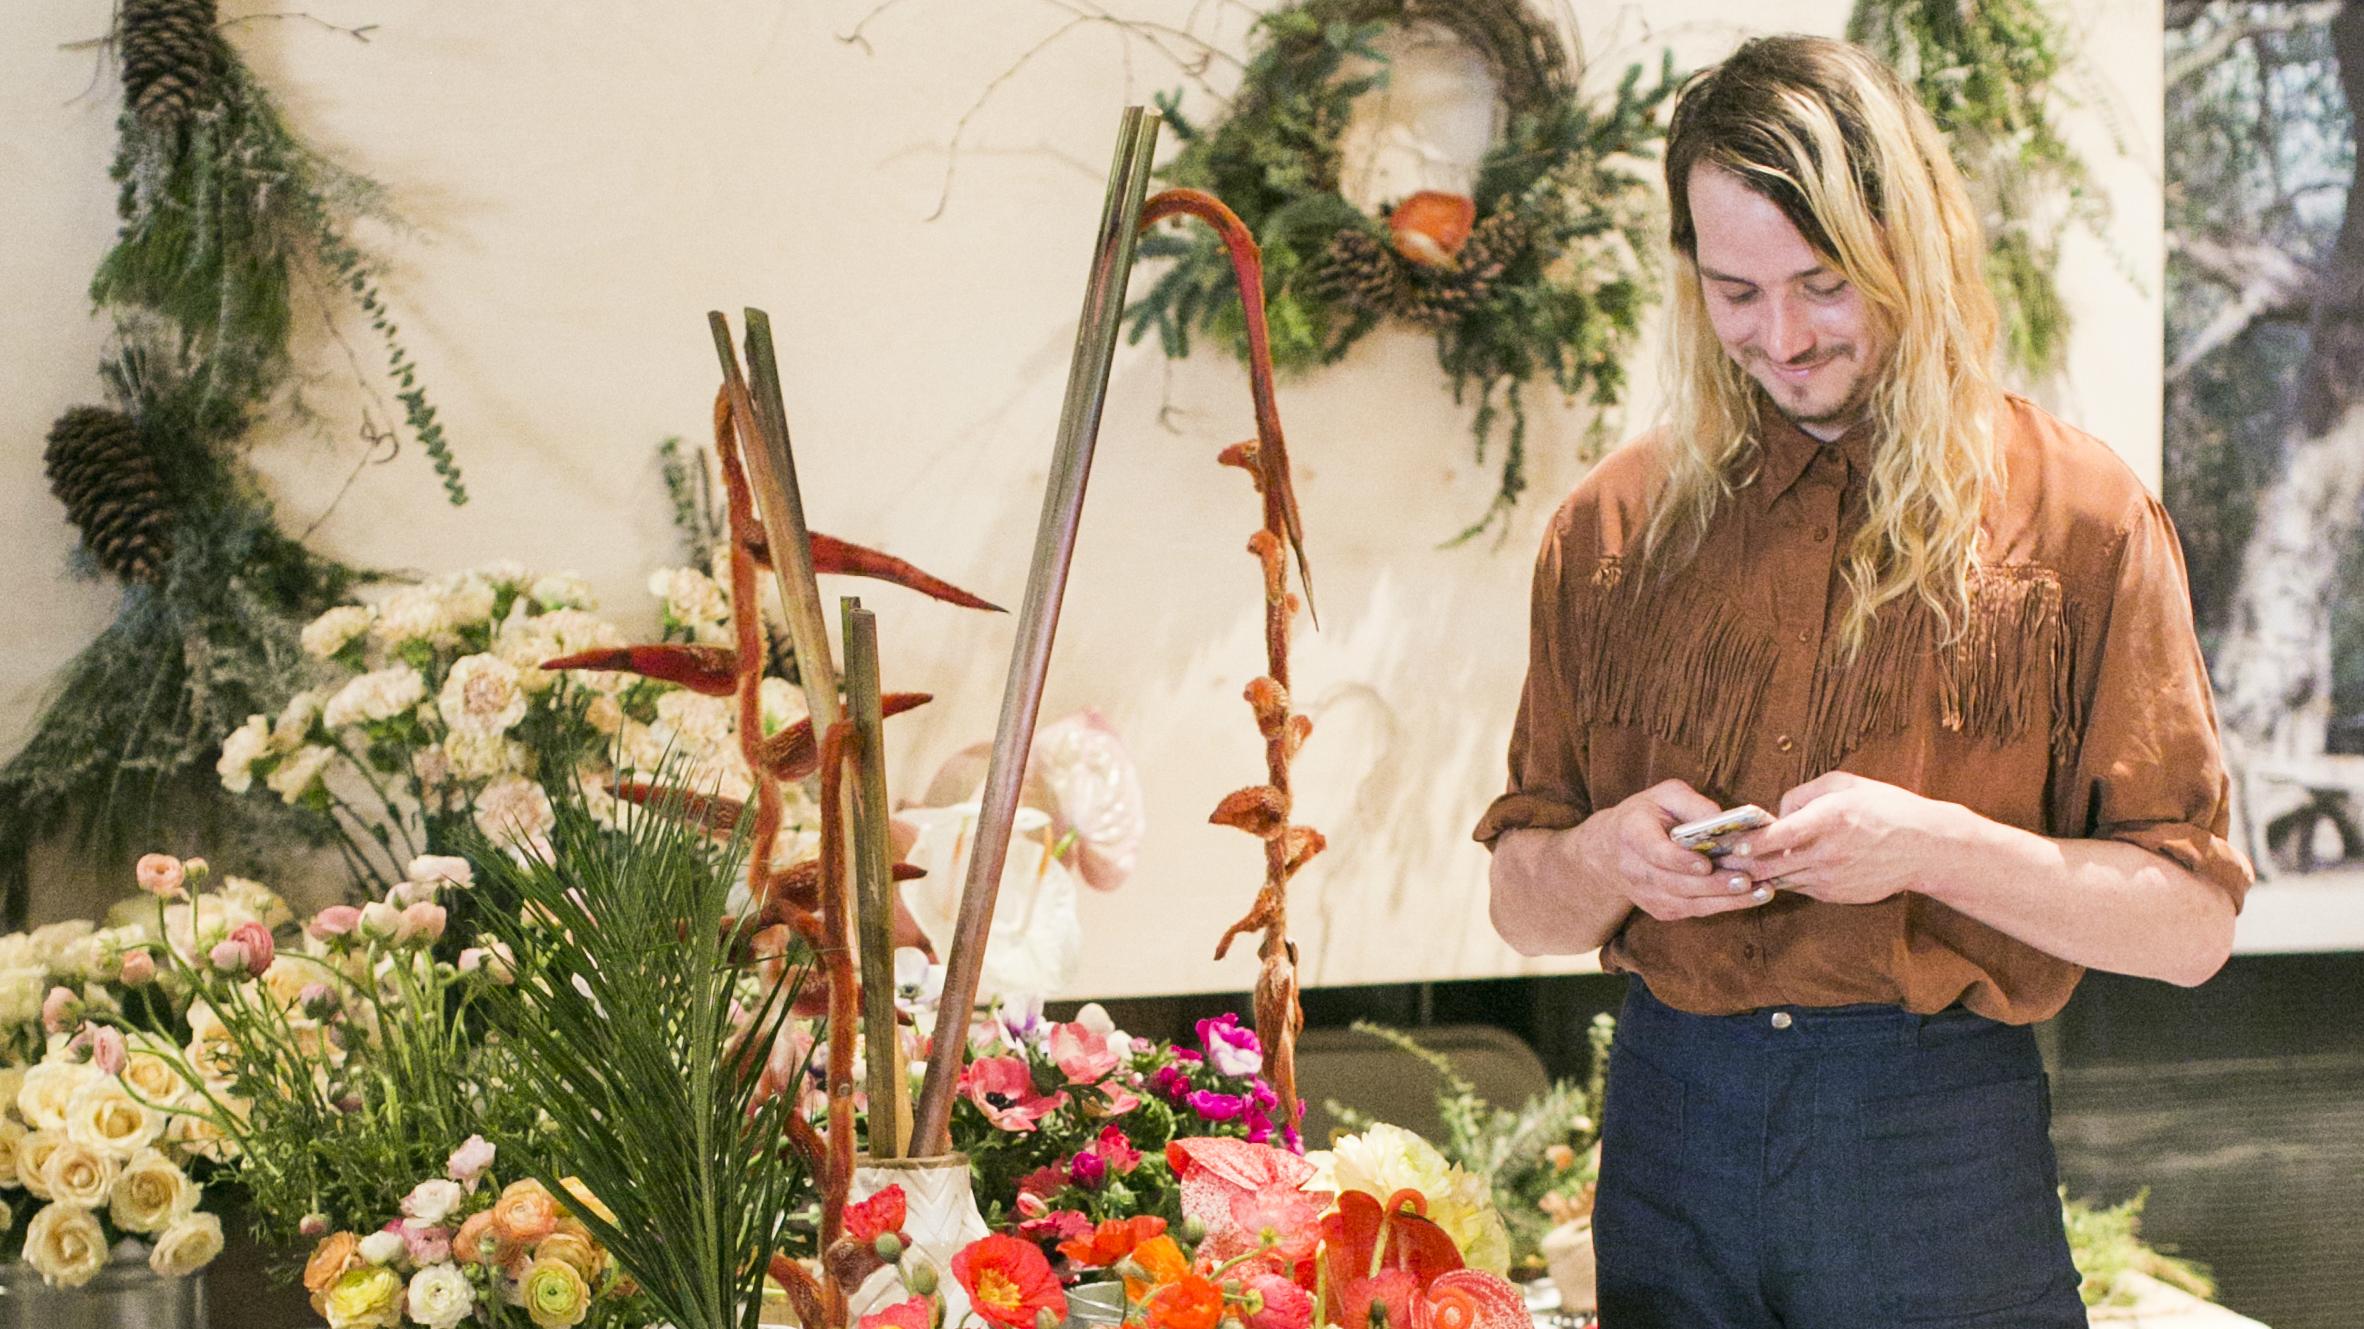 hippies meet dating site